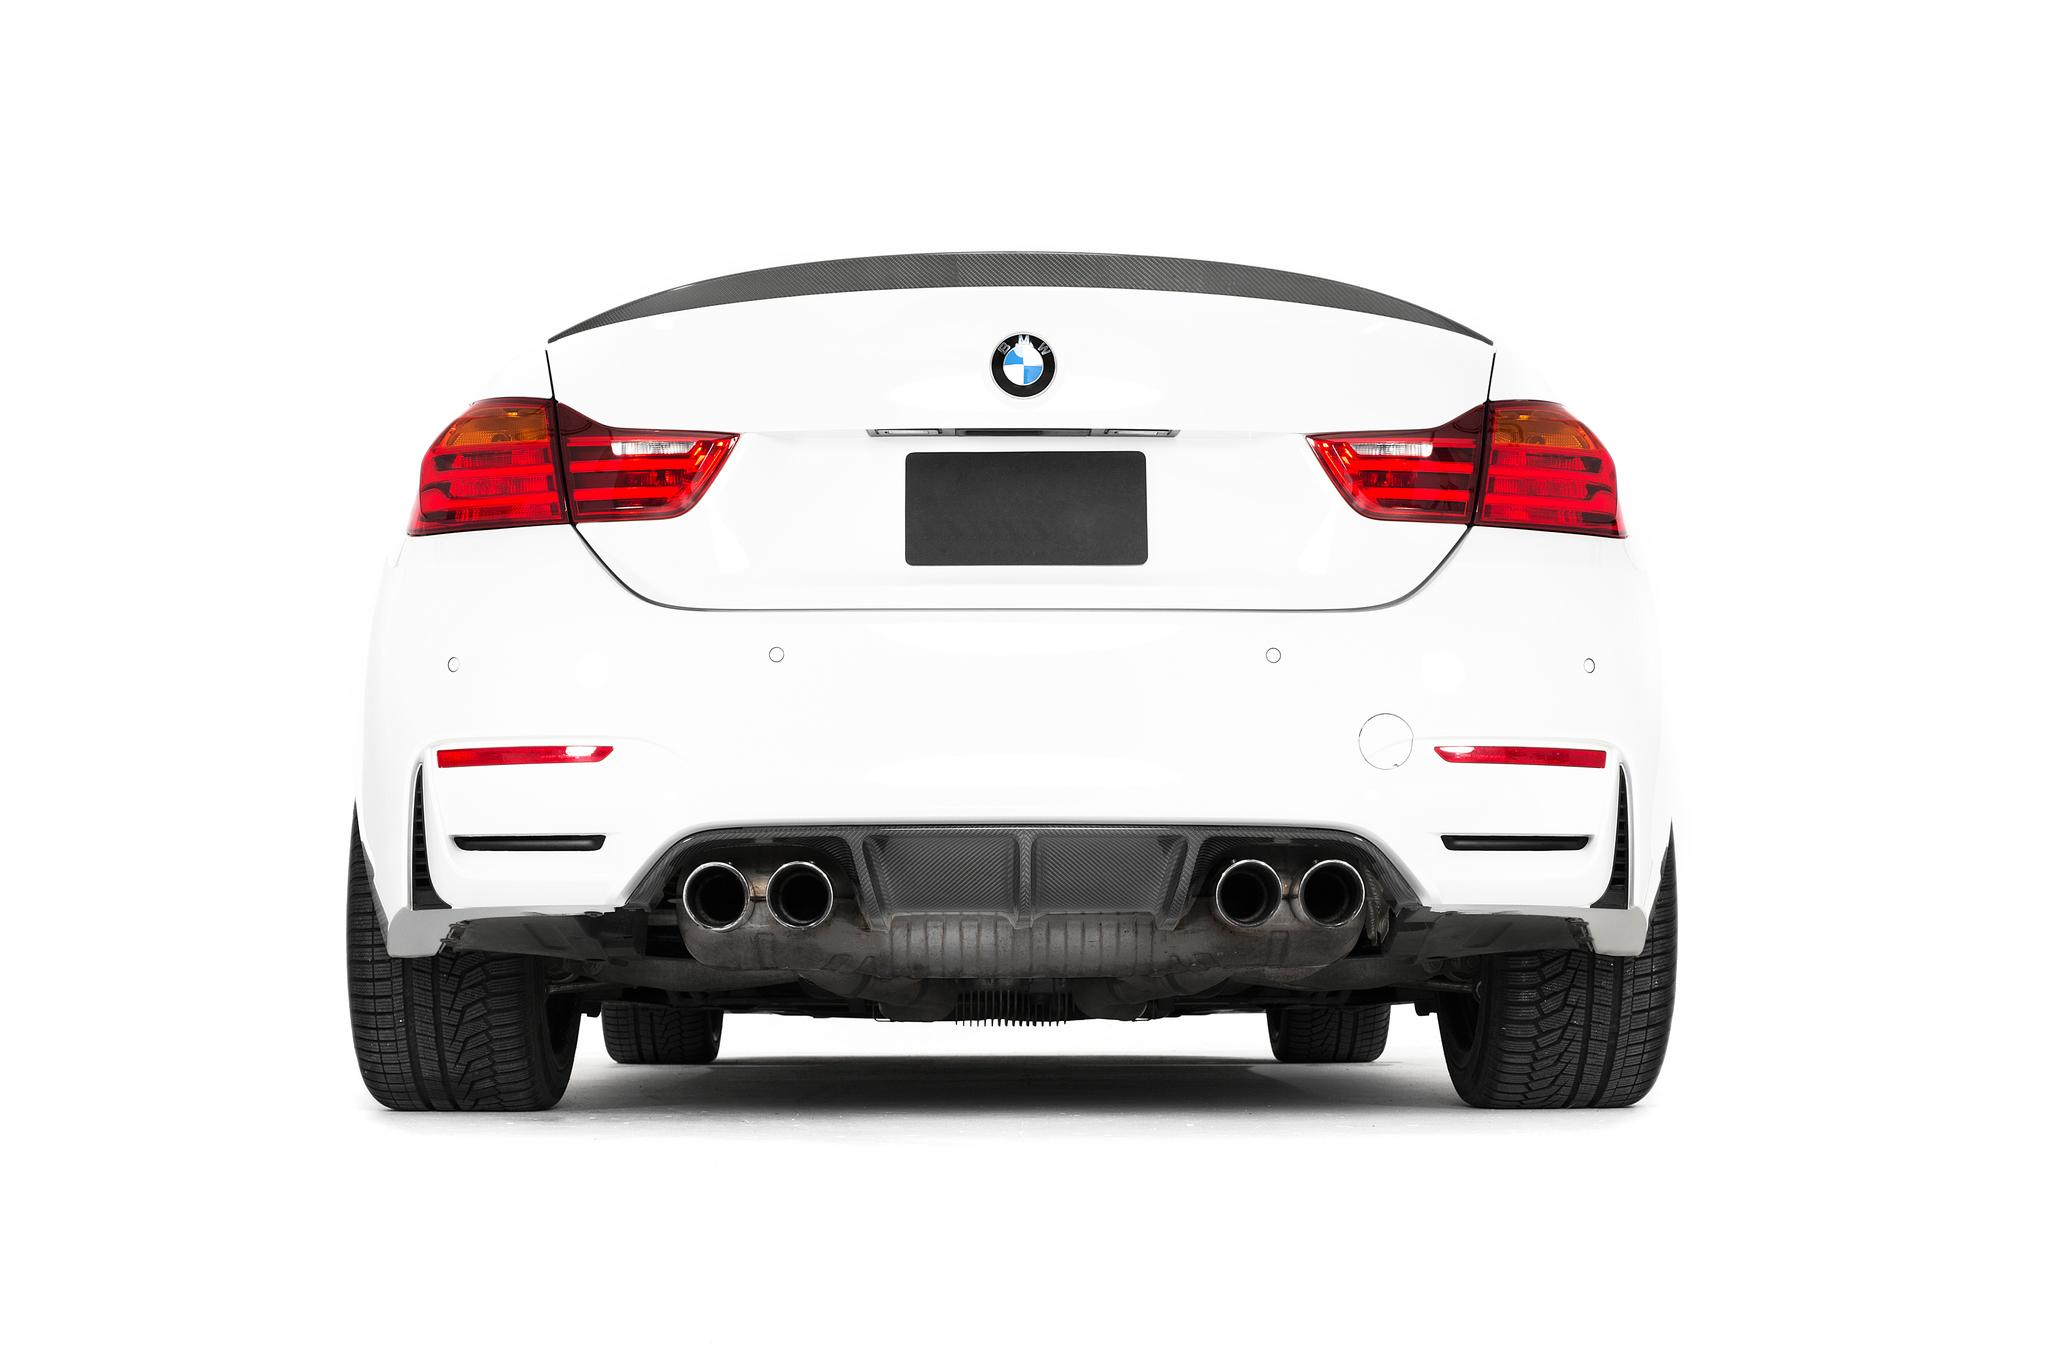 Sterckenn Carbon Fiber diffuser for BMW M4 F82 new model